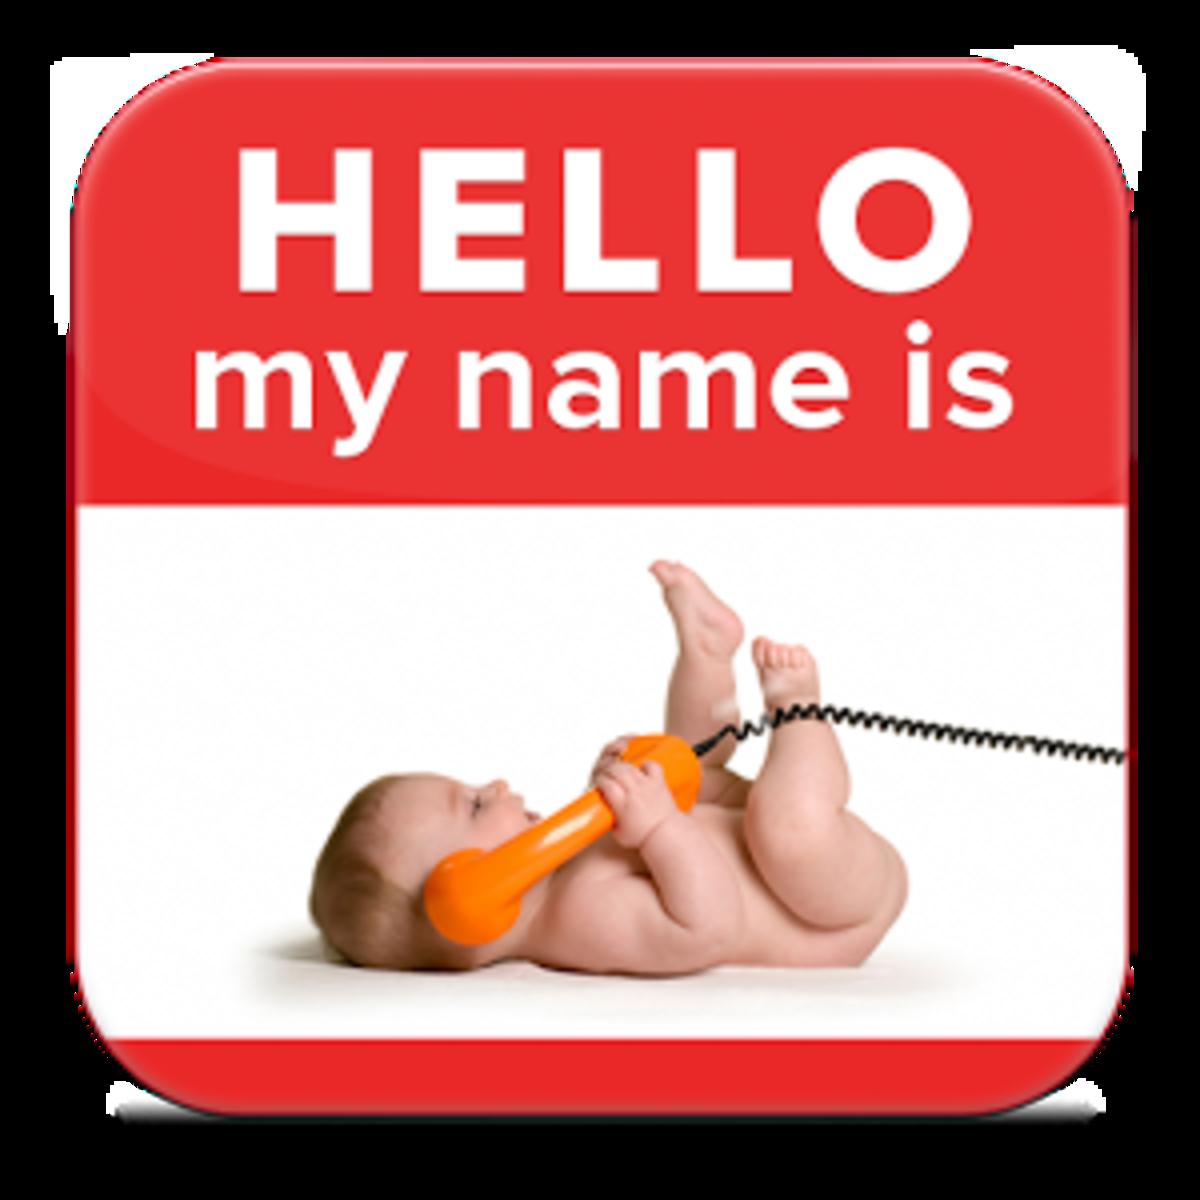 5 Baby Name Trends 2014 www.TodaysMama.com